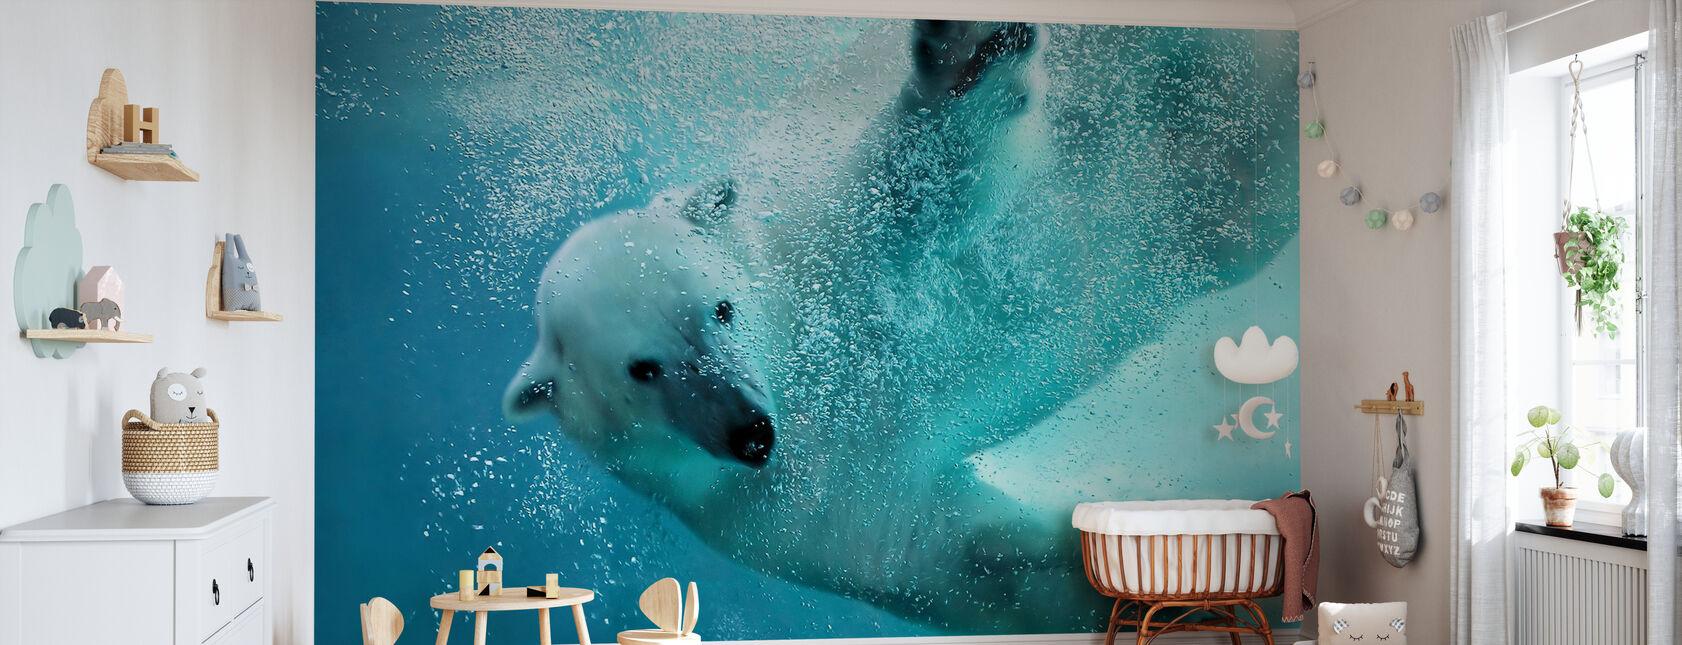 Underwater Polar Bear - Wallpaper - Nursery